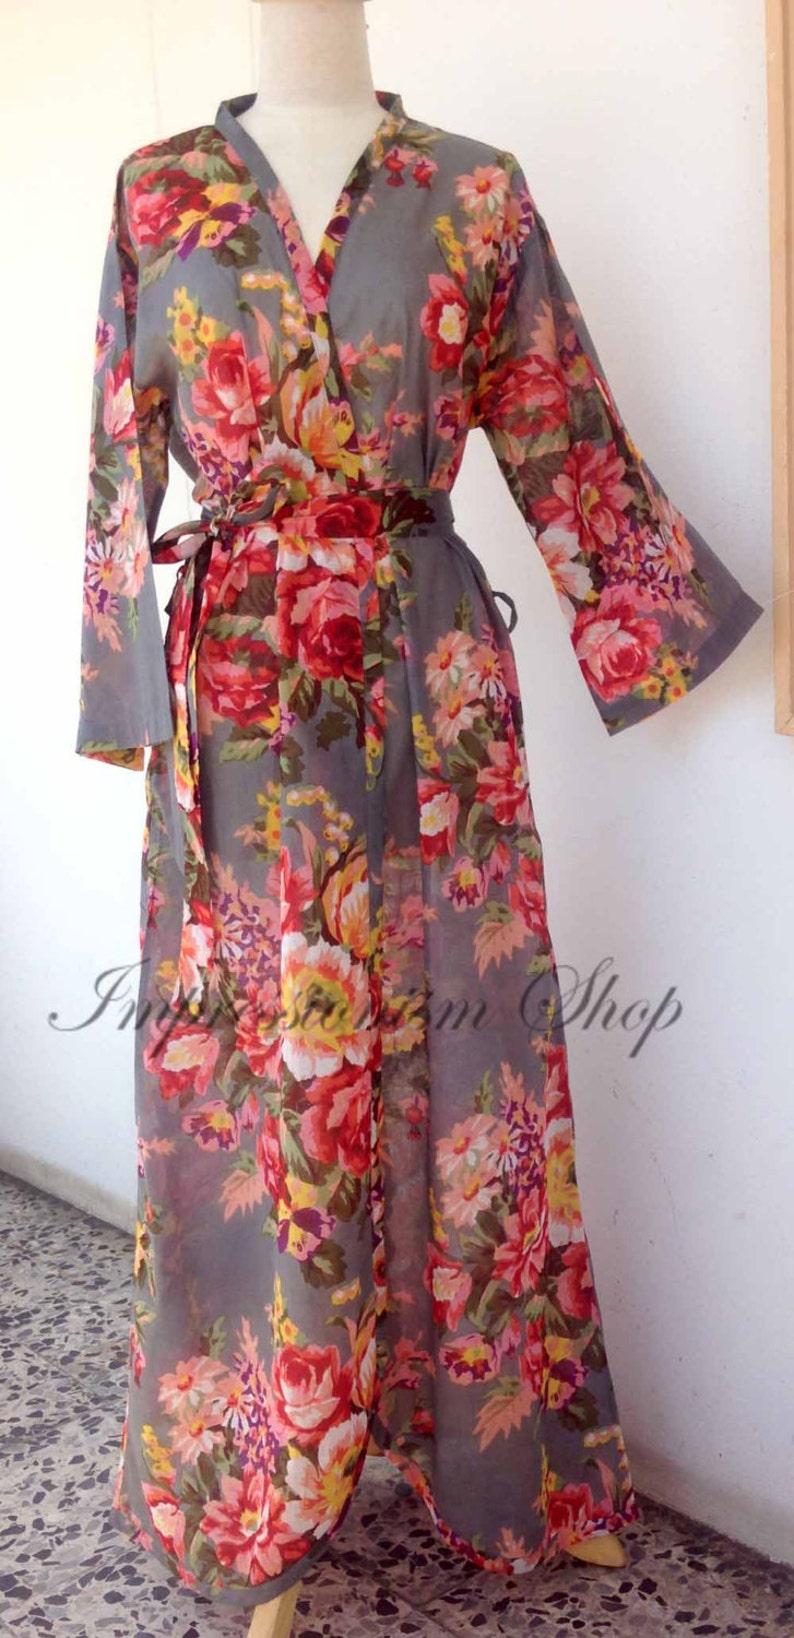 85b8b7edf8 Pregnancy gowns Delivery robe Labor robe Plus size Kaftans